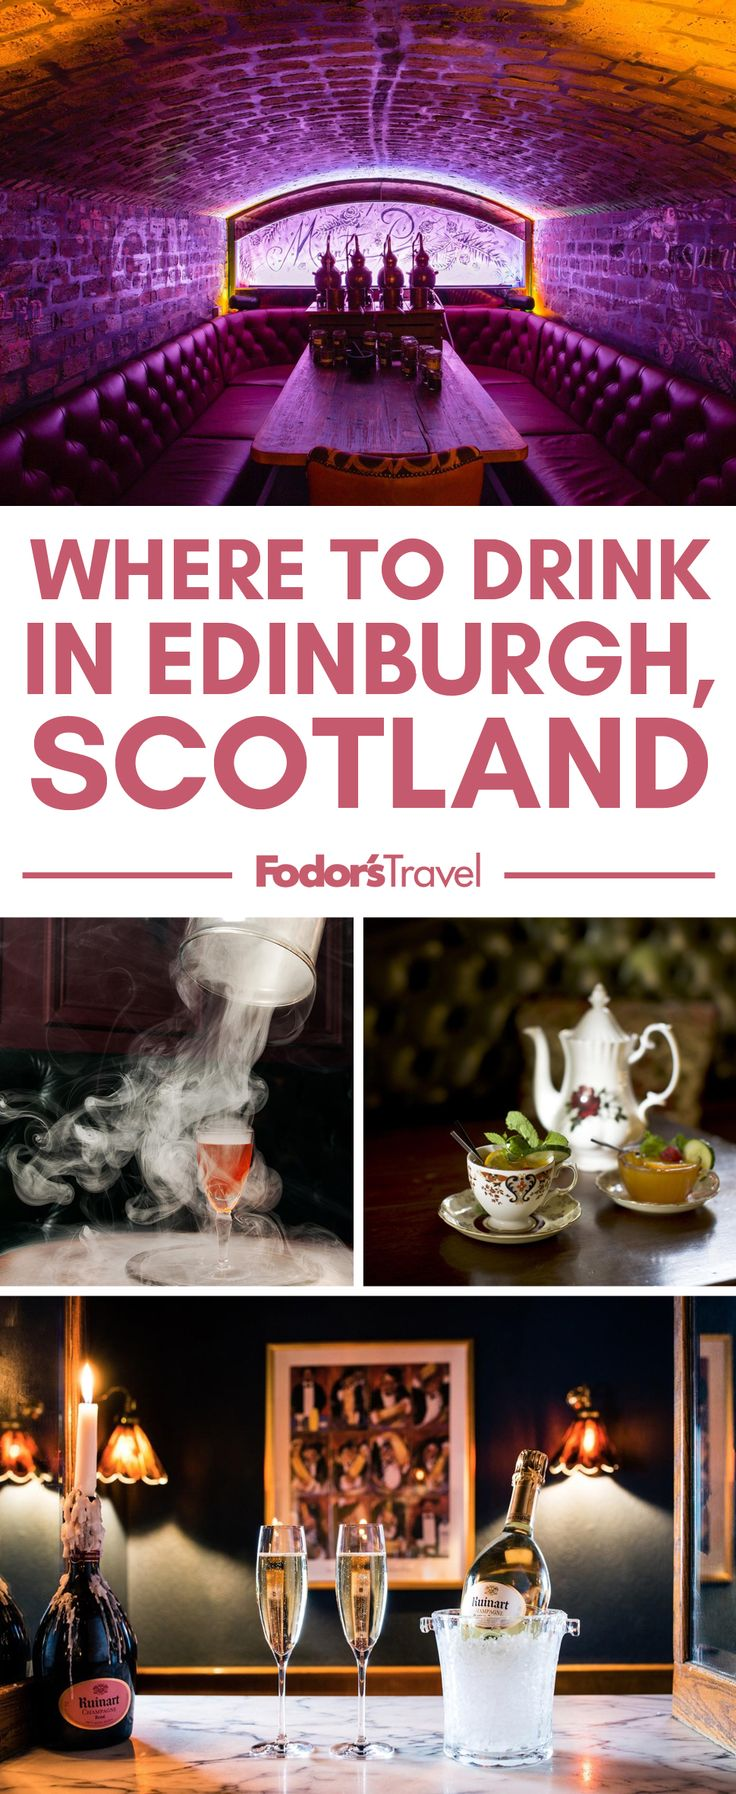 Edinburgh's drinks scene goes far beyond whisky and old pubs. #edinburgh #Scotland #UK #Europe #nightlife